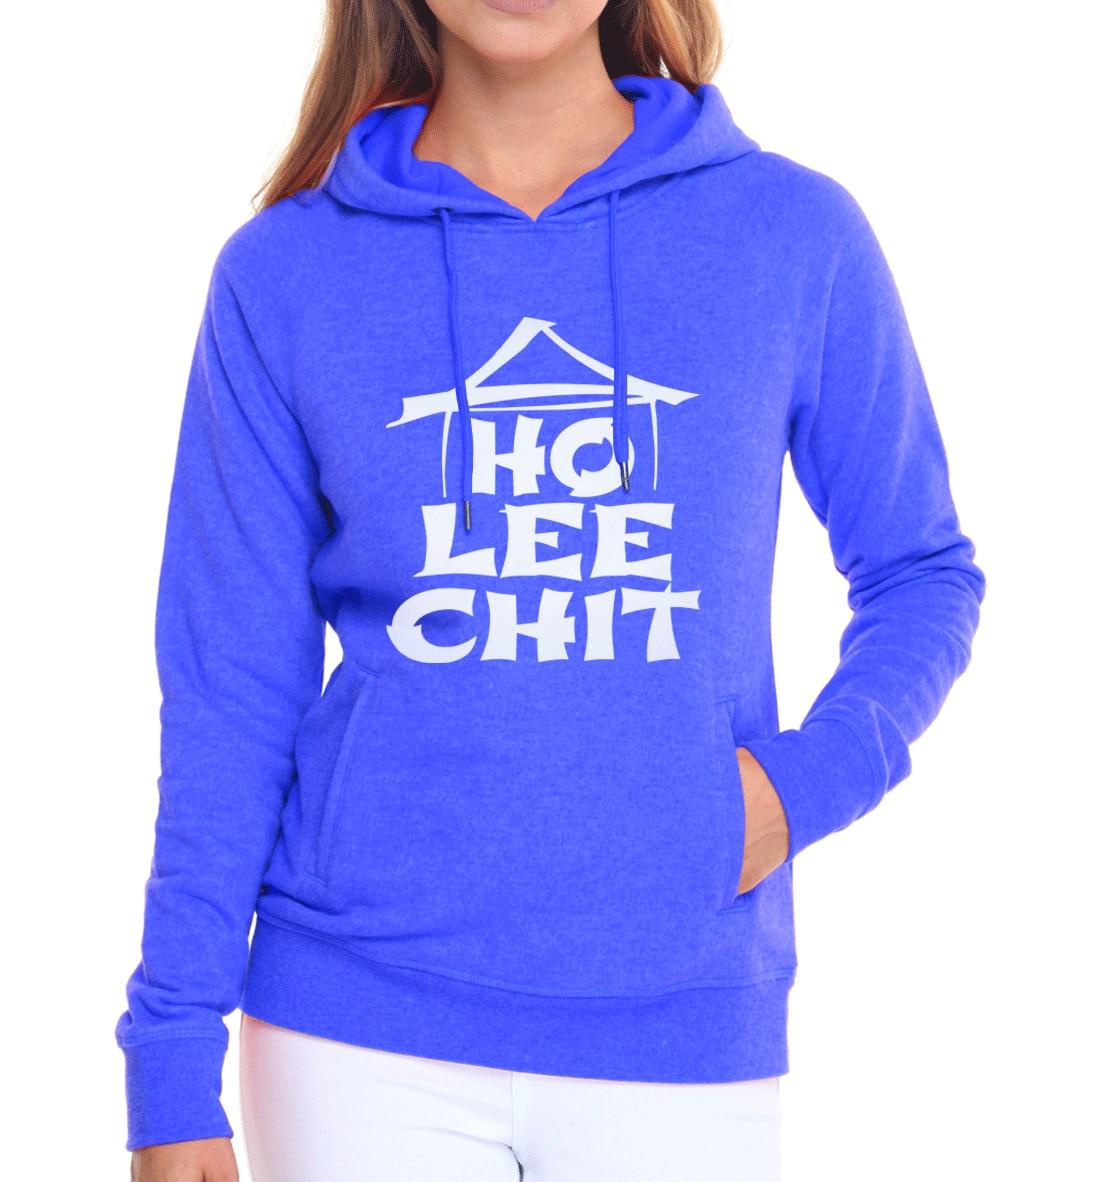 fitness bodybuilding pullovers Ho Lee Chit printing sweatshirts women brand tracksuits 2019 fashion autumn winter fleece hoodies